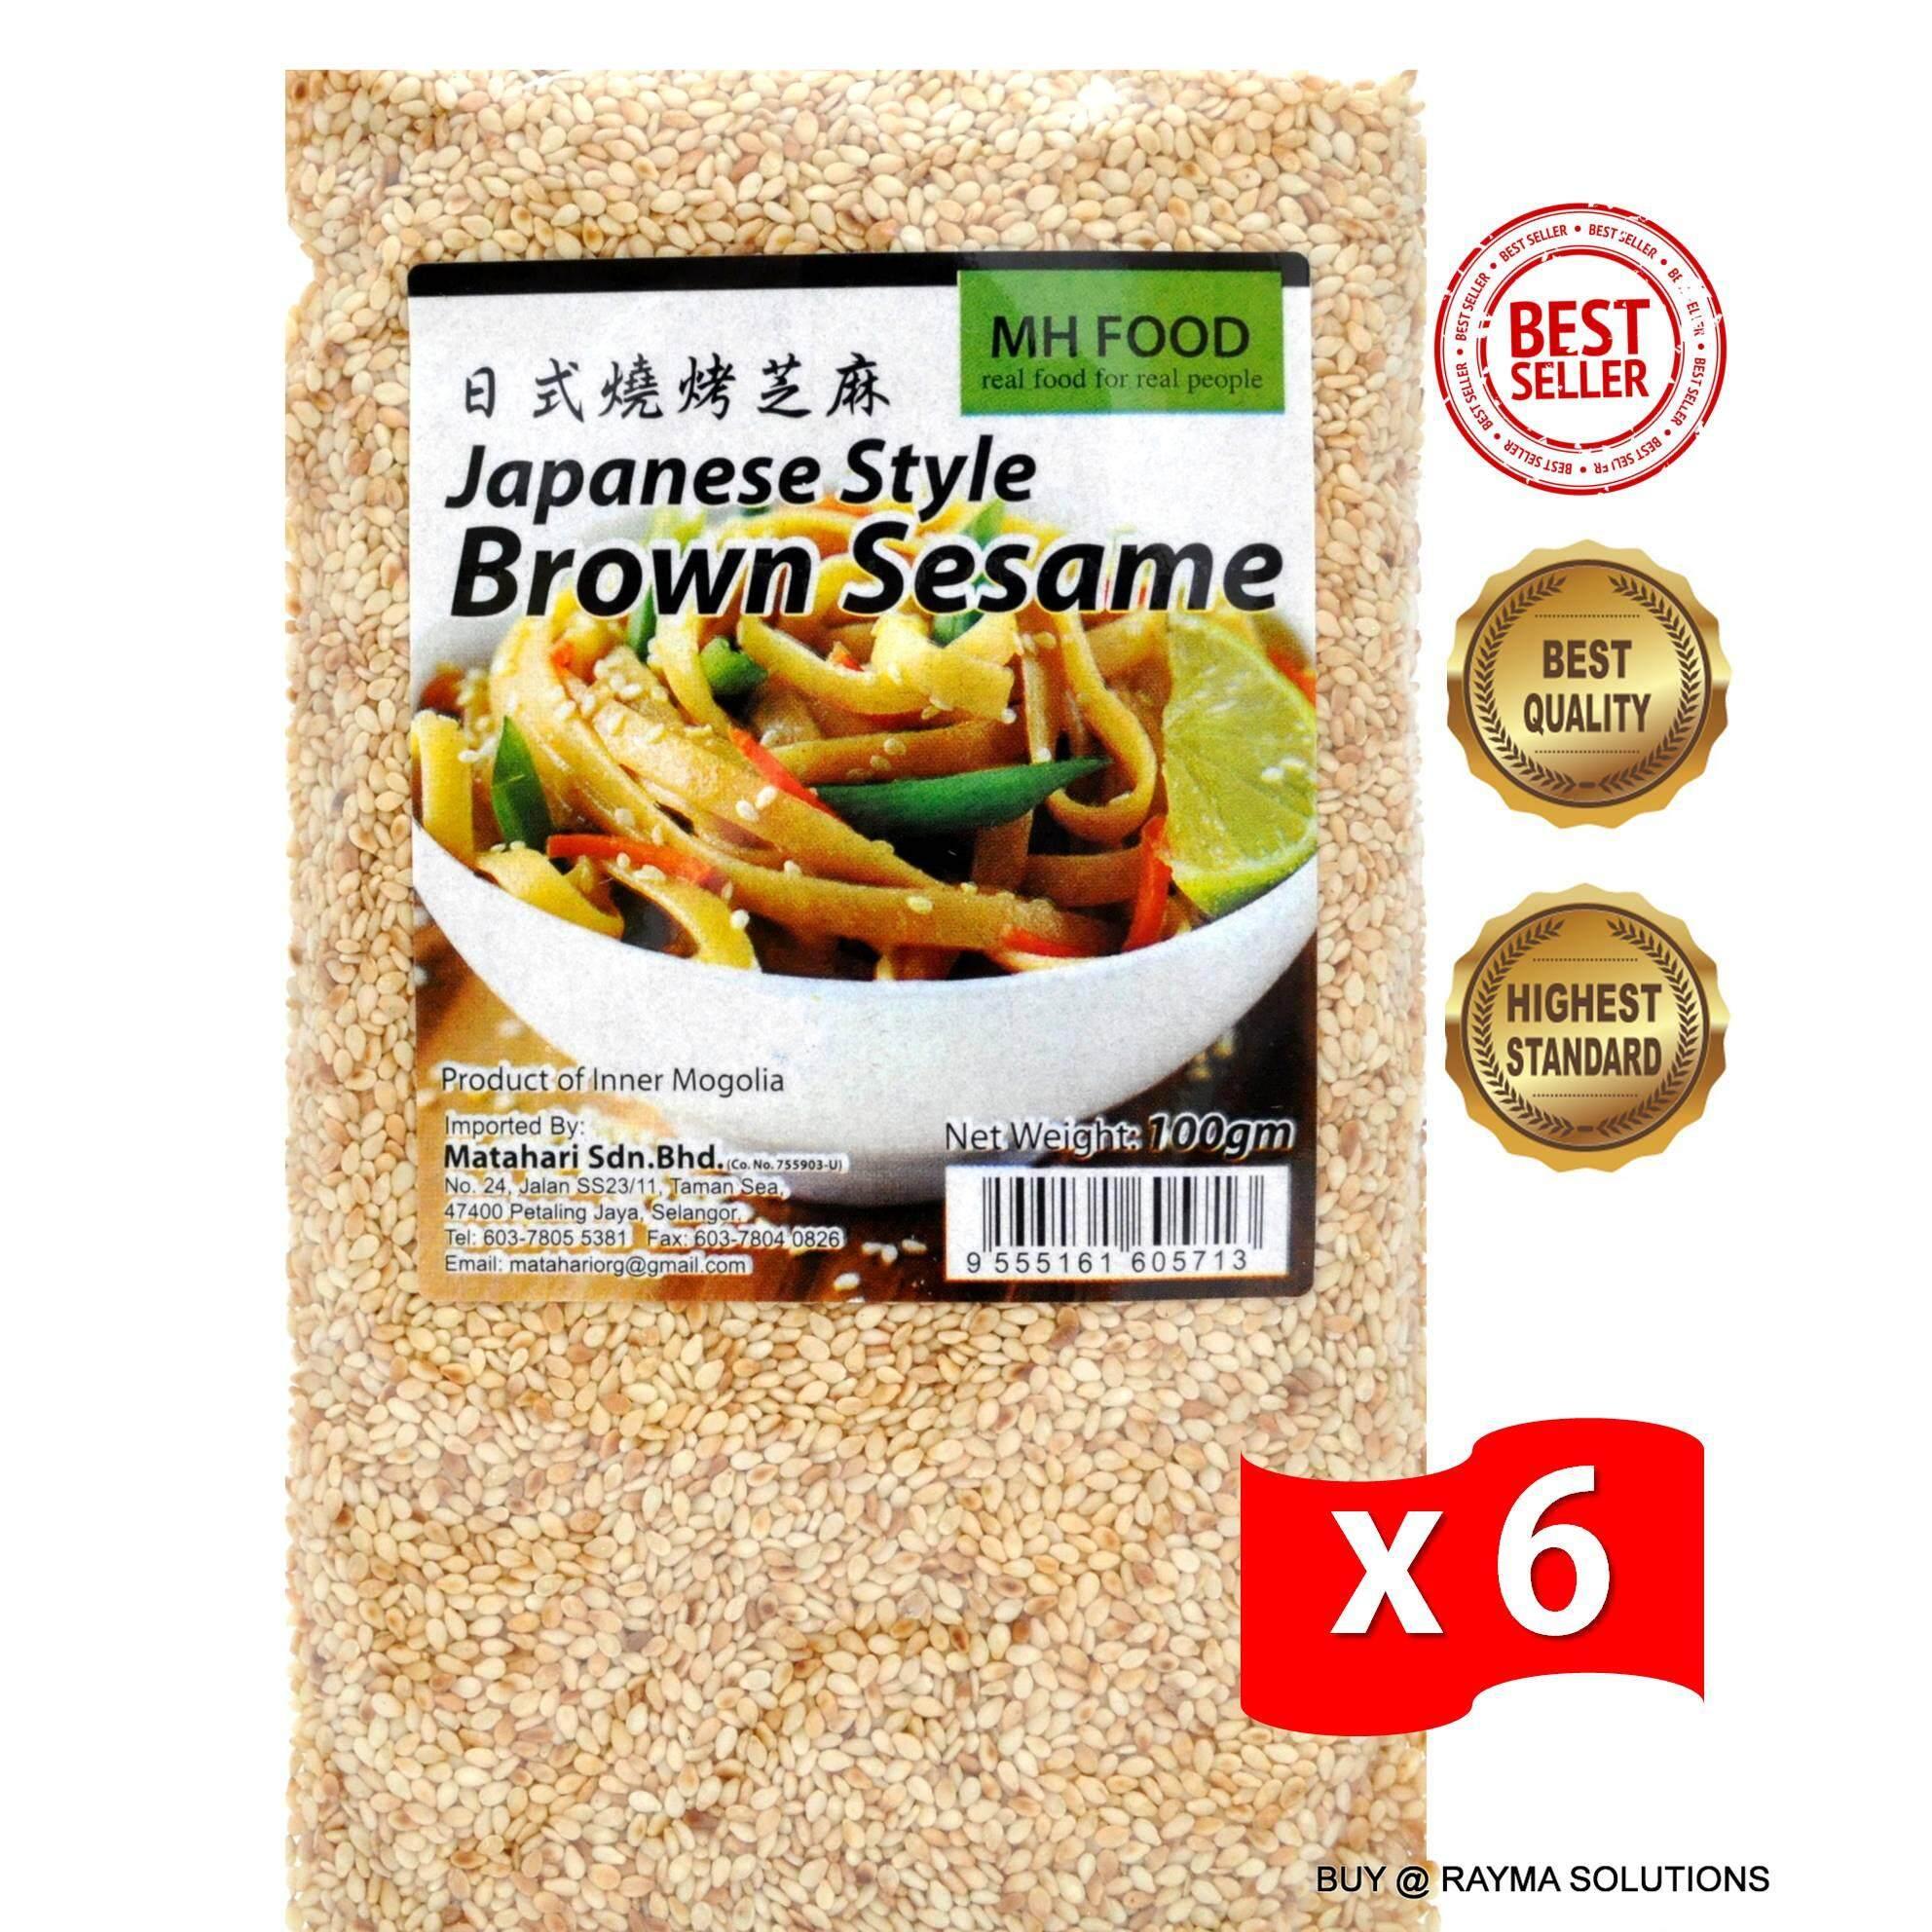 [Best Deal] MH FOOD Japanese Style Organic Brown Sesame Seed 100g (6 Packs)